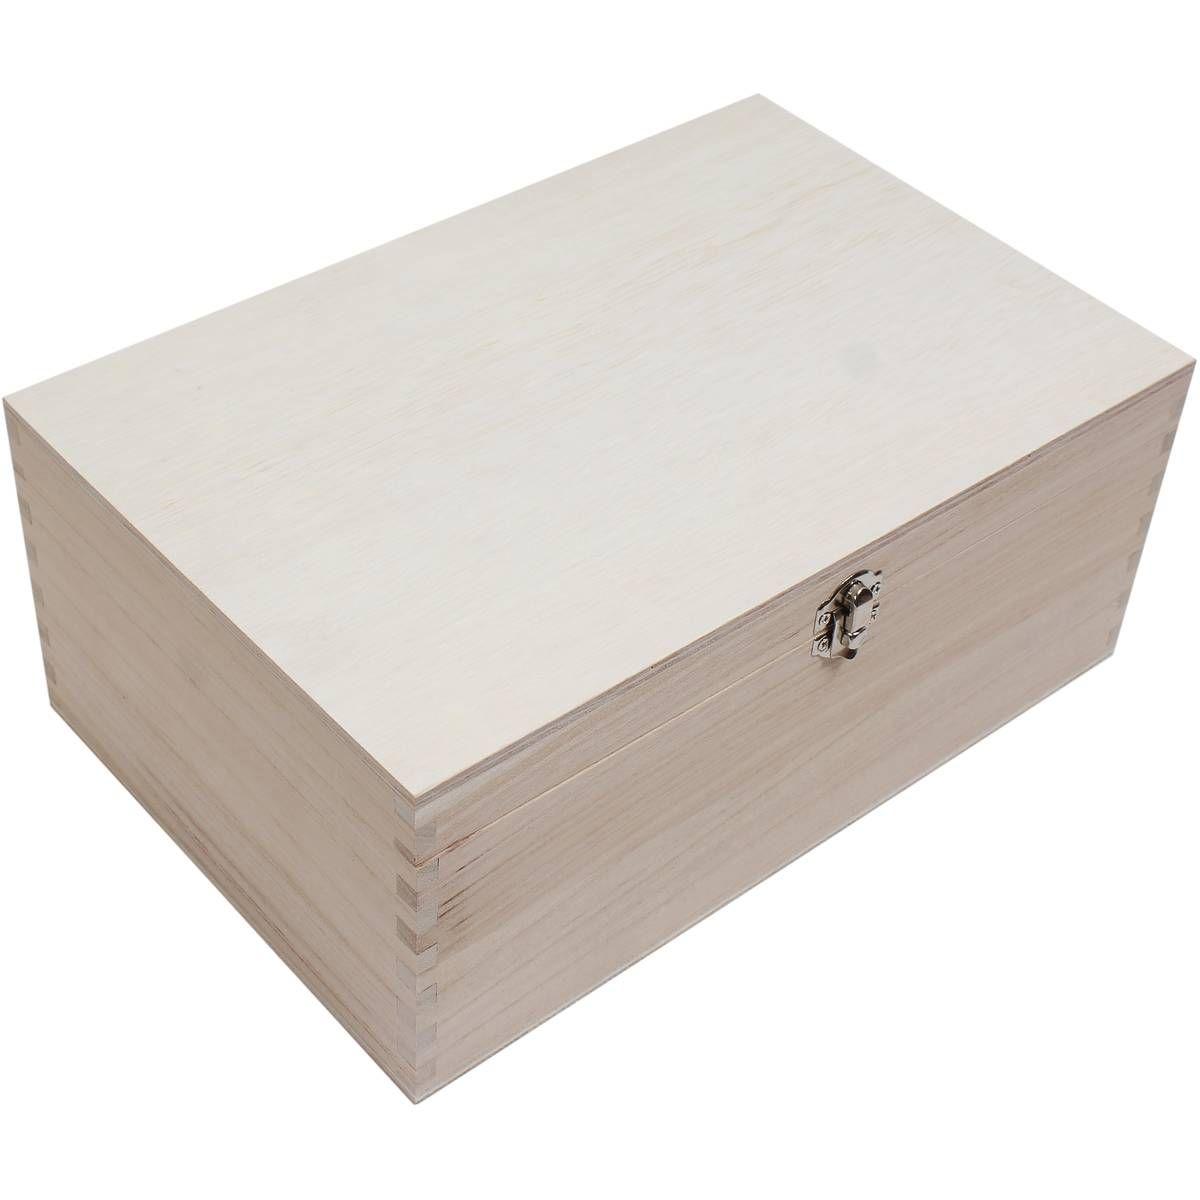 Bon Wooden Storage Box 30 X 20 X 13 Cm | Hobbycraft